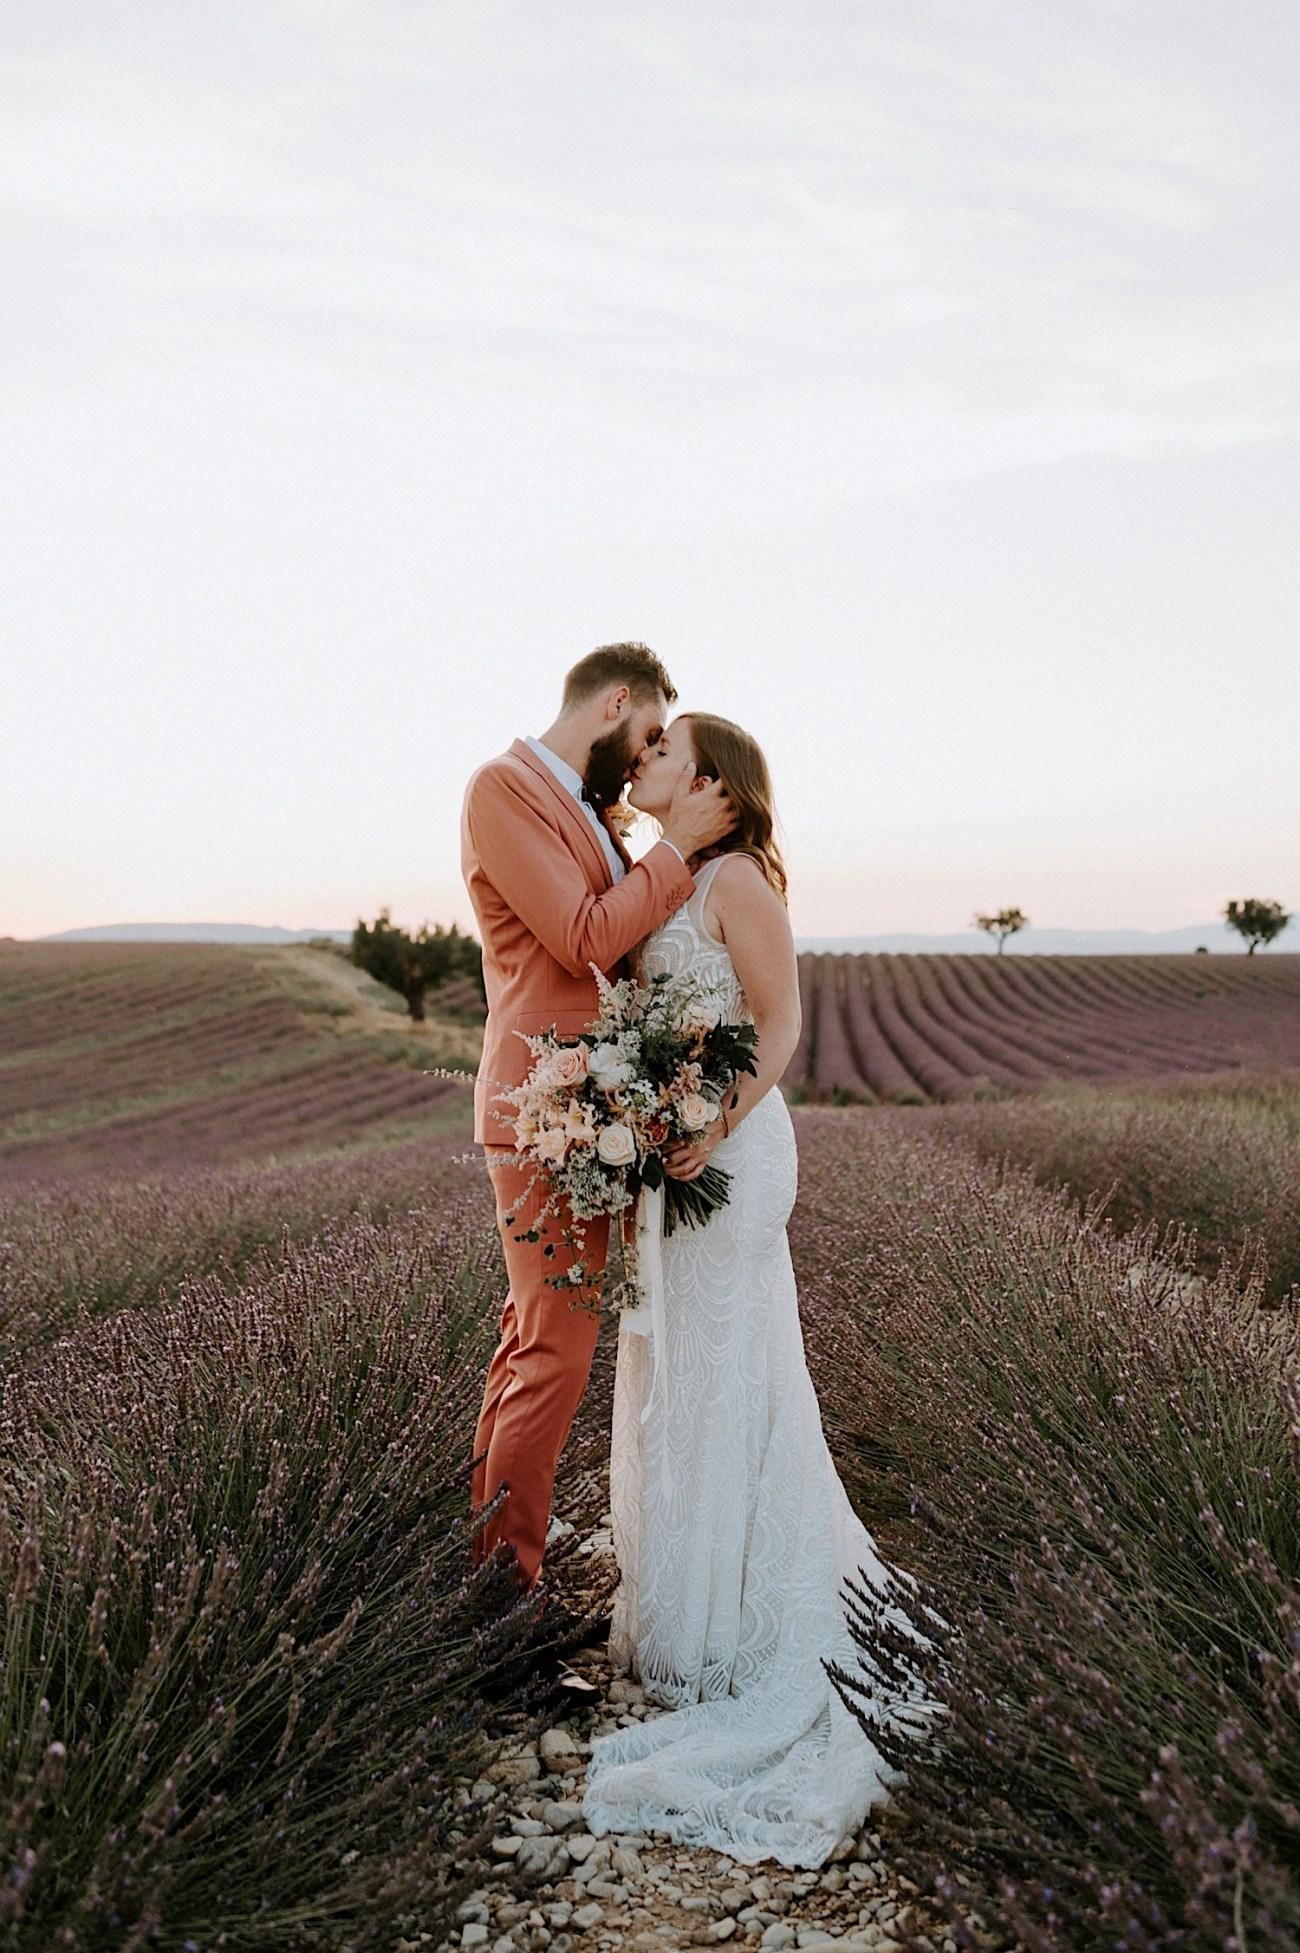 Valensole Wedding Photos Lavender Field Wedding Provence Wedding French Wedding Photographer Destination Wedding France Anais Possamai Photography 03